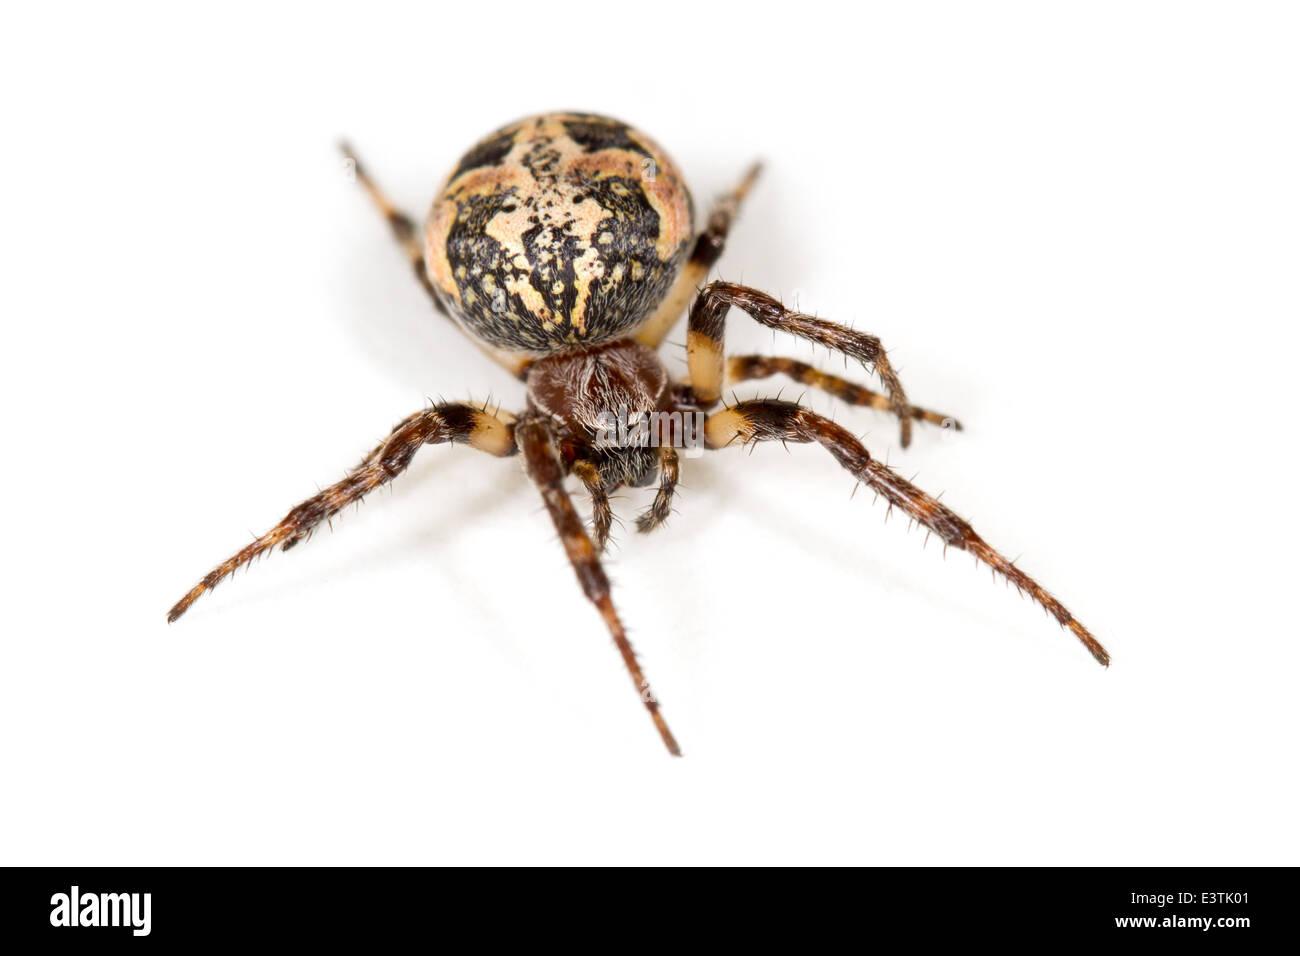 Female Furrow Orb-weaver (Larinioides cornutus) spider, part of the family Araneidae -  Orbweavers. Isolated on Stock Photo